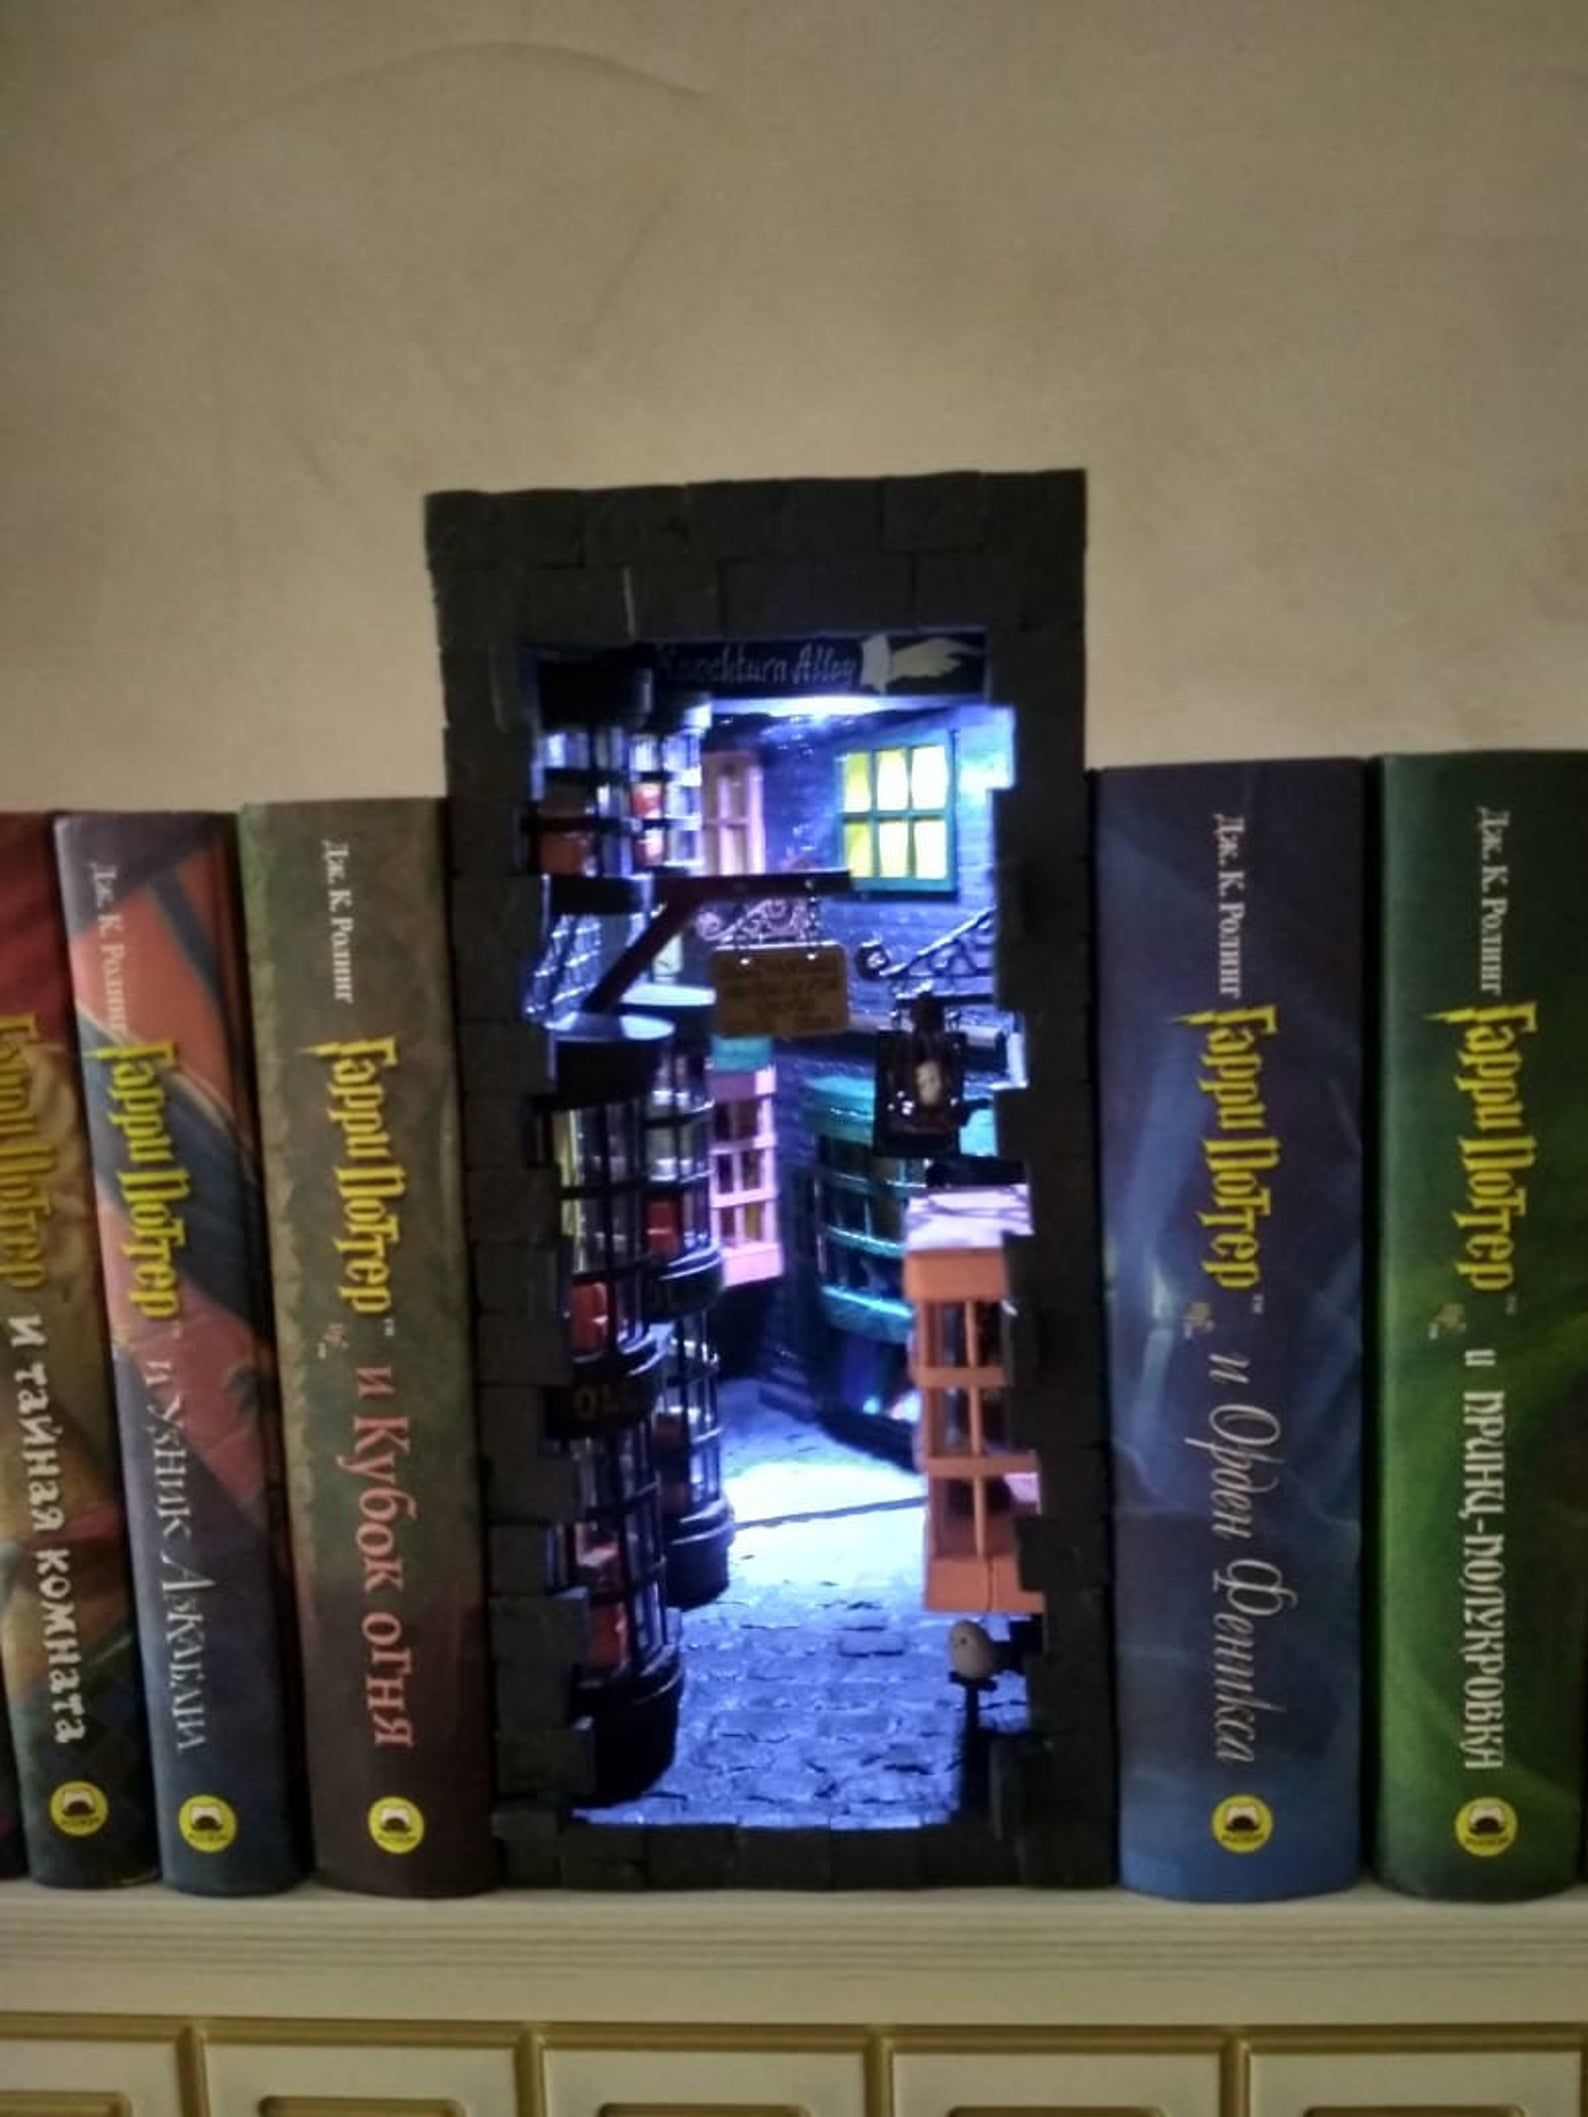 Book Nook Magic Alley Booknook Book Shelf Inserts Book End Etsy Book Nooks Library Decor Handmade Bookshelves